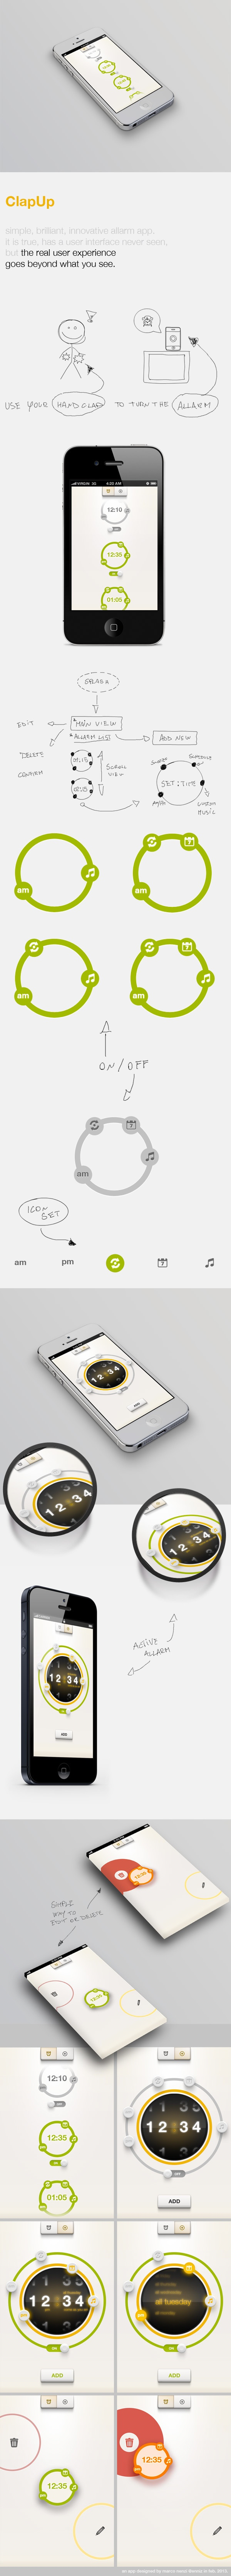 ClapUp - iOS simple and brillant allarm's App by Marco Nenzi, via Behance